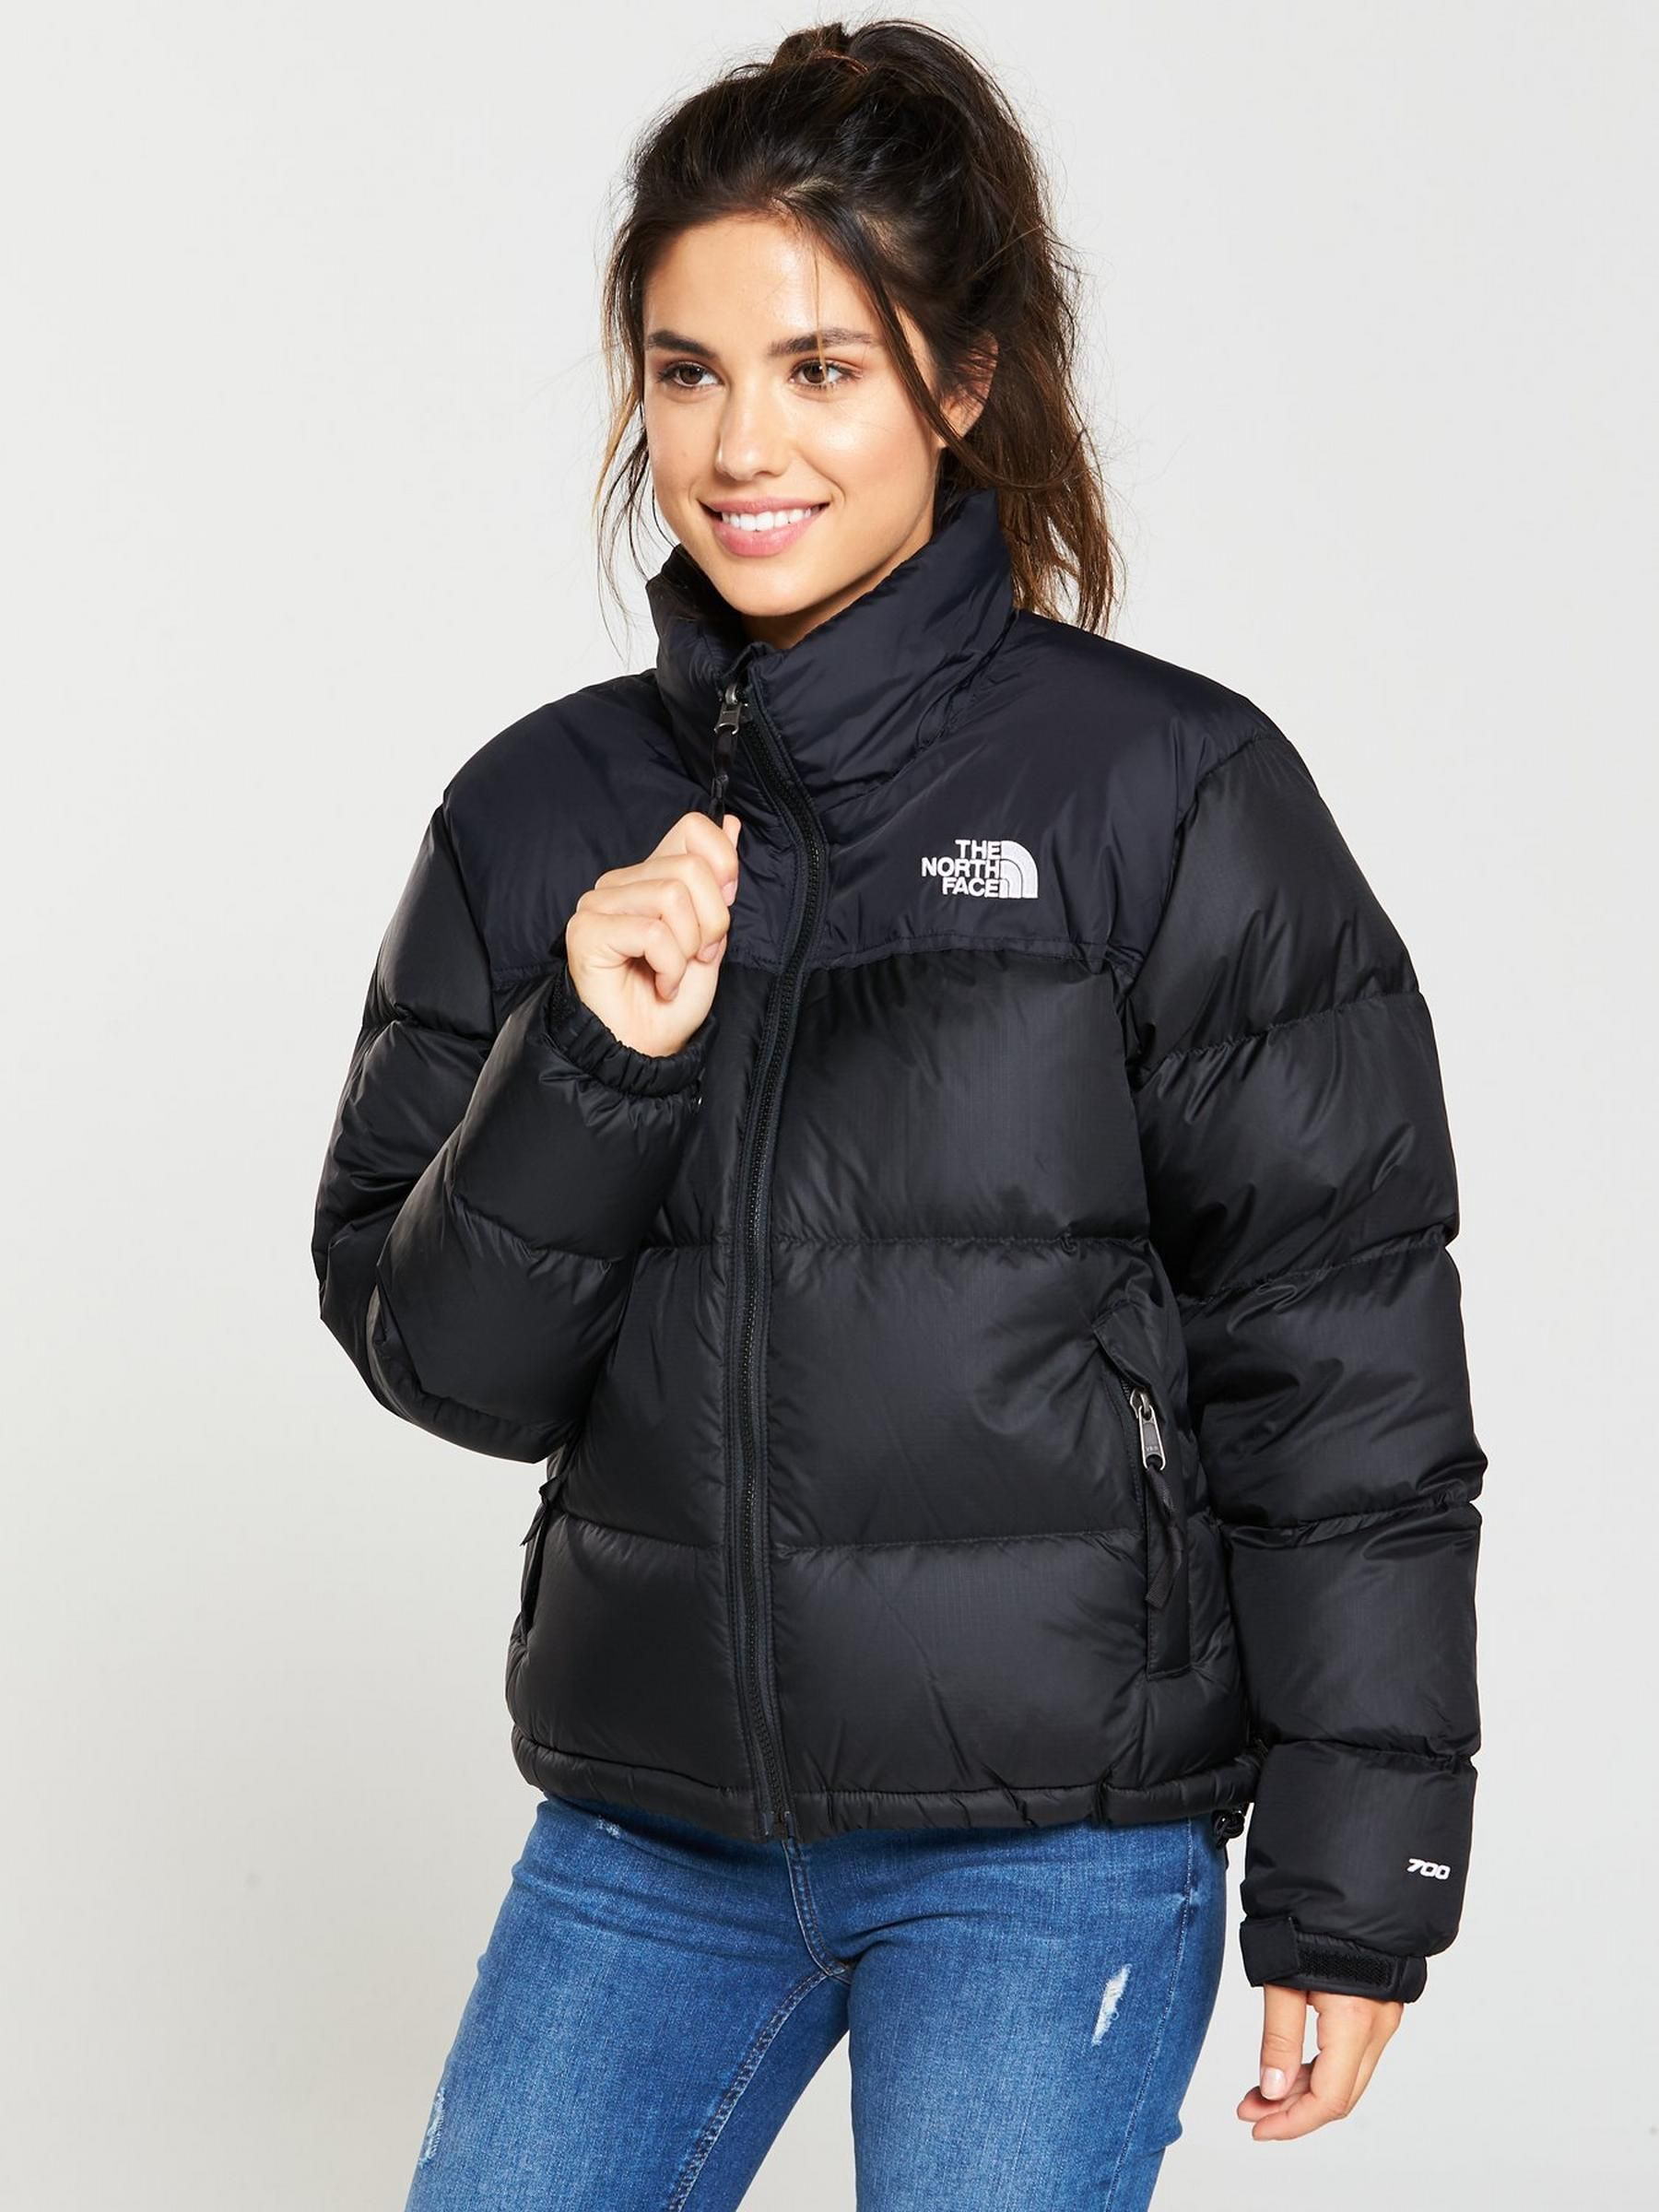 Pin By Taiisha Villarreal On Down Jacket The North Face North Face Outfits North Face Puffer Jacket Winter Jacket North Face [ 2400 x 1800 Pixel ]